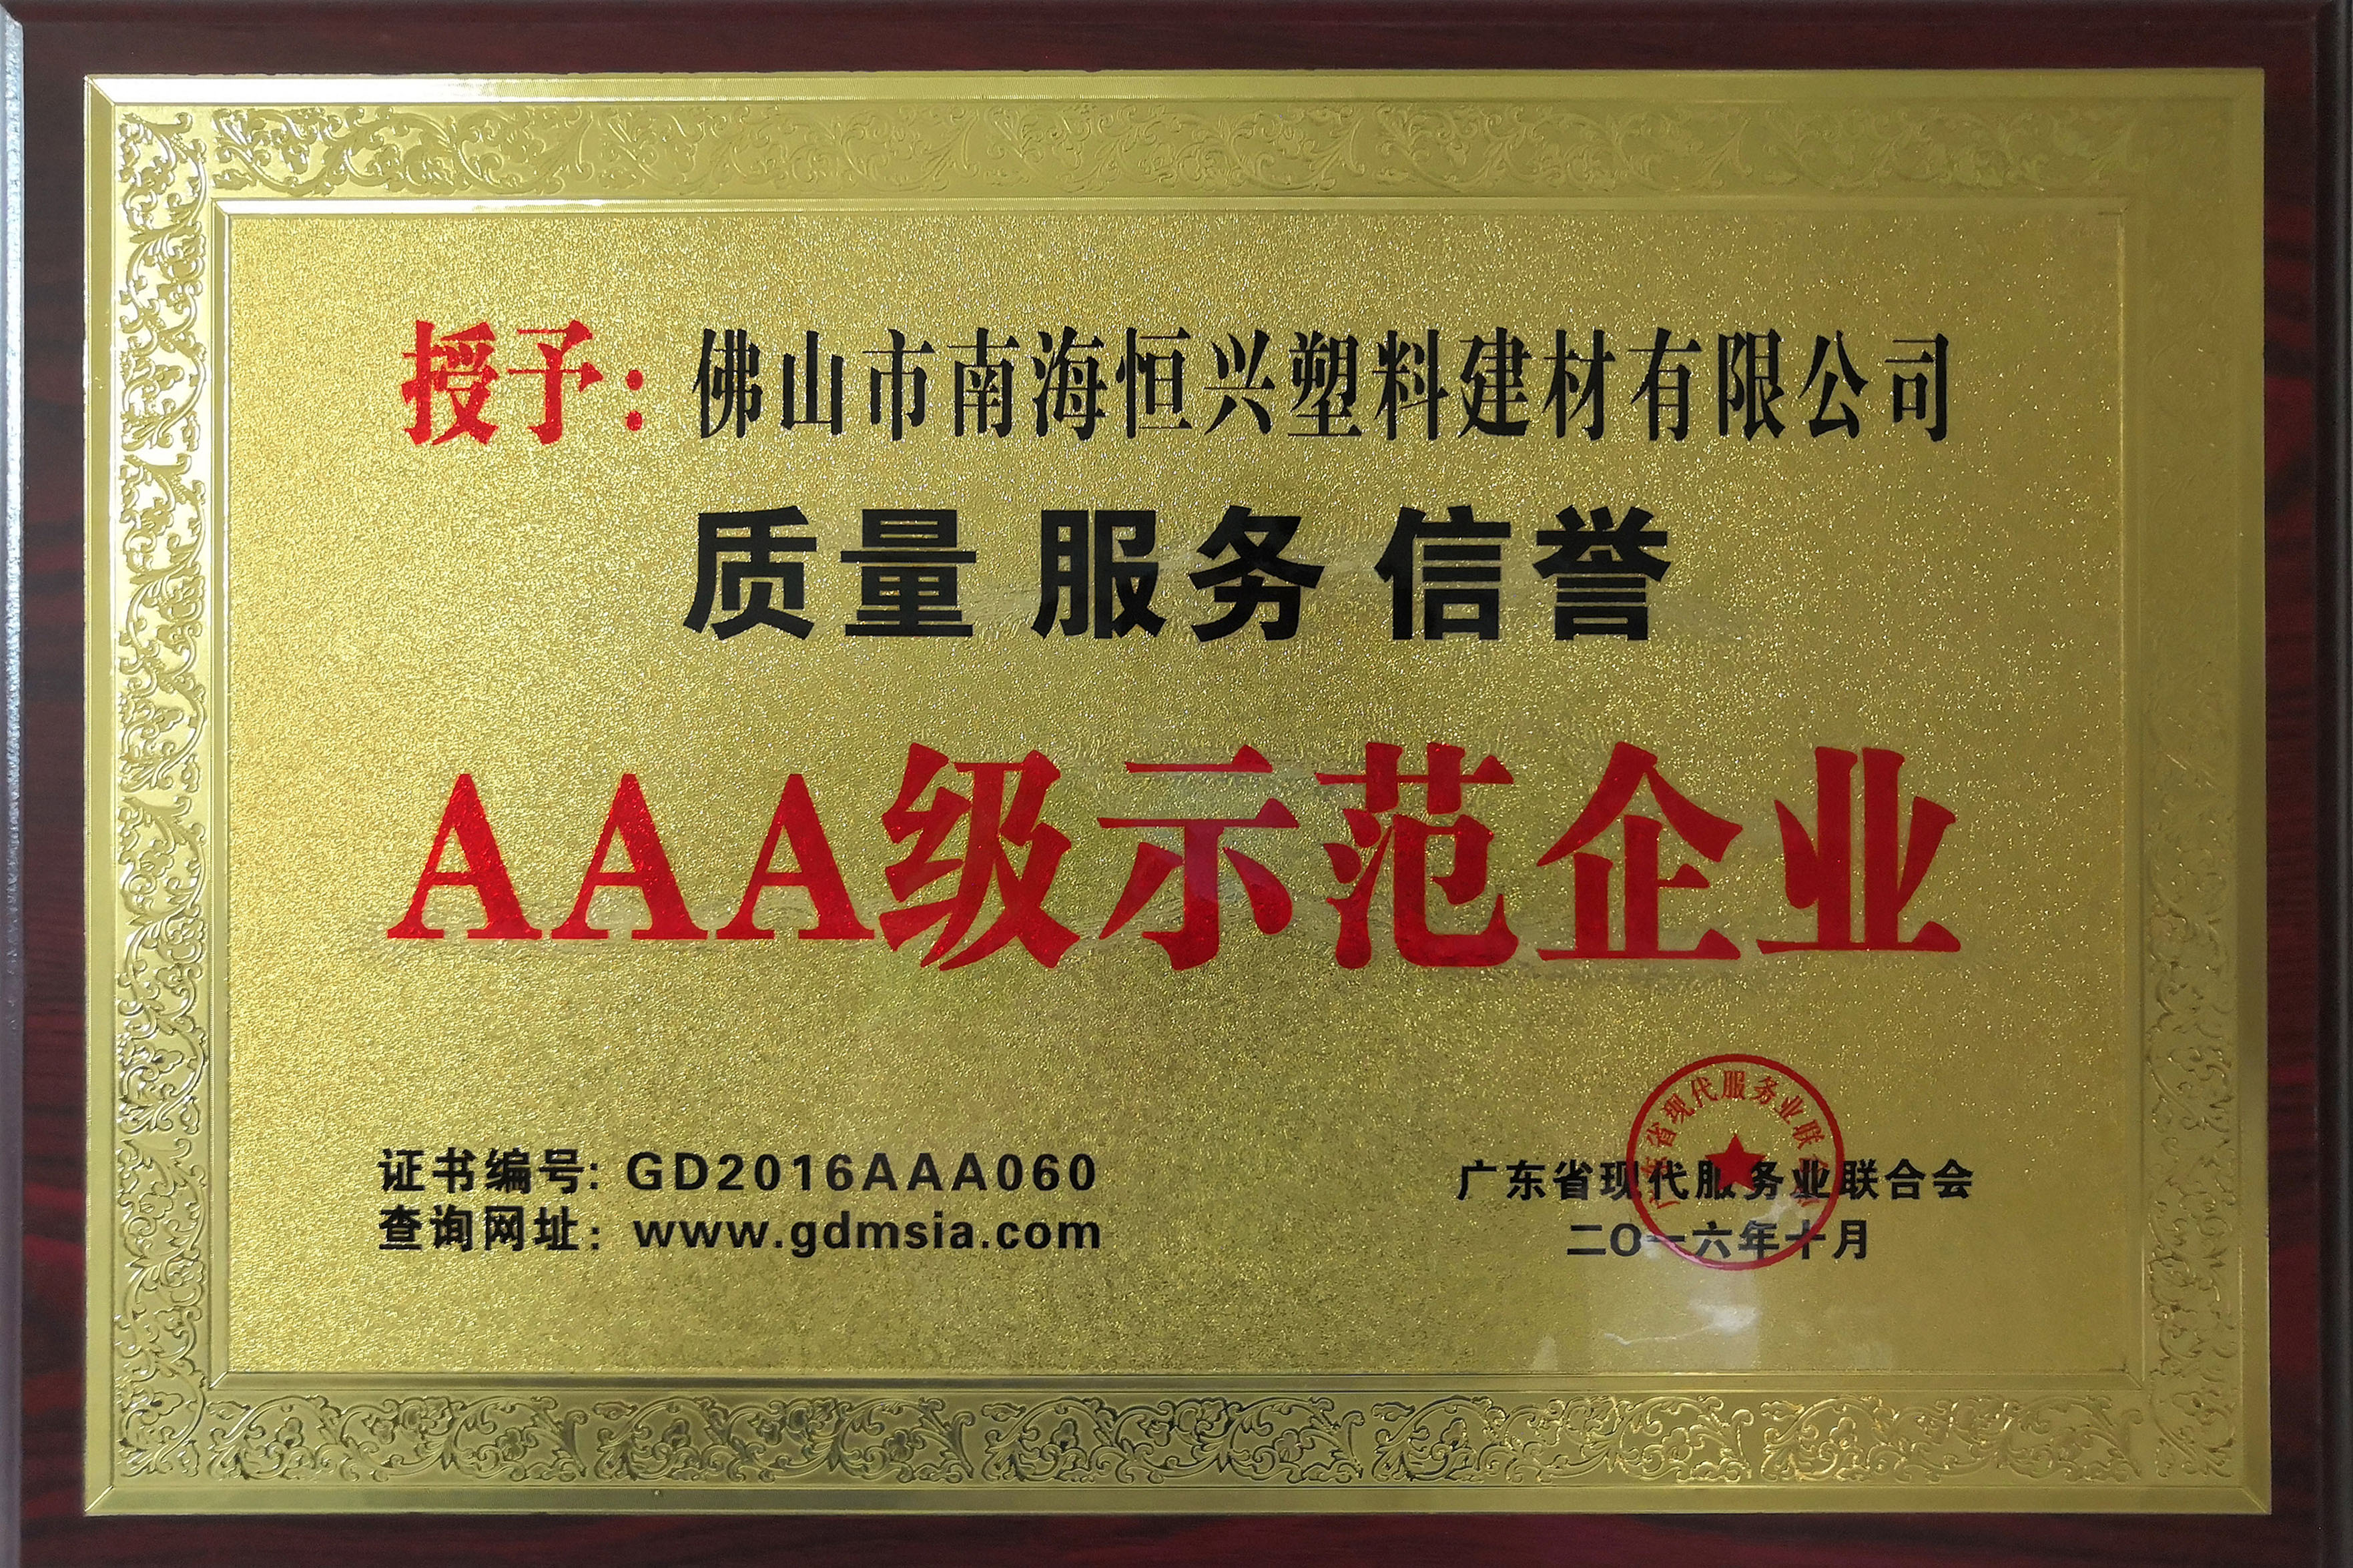 AAA級示范企業